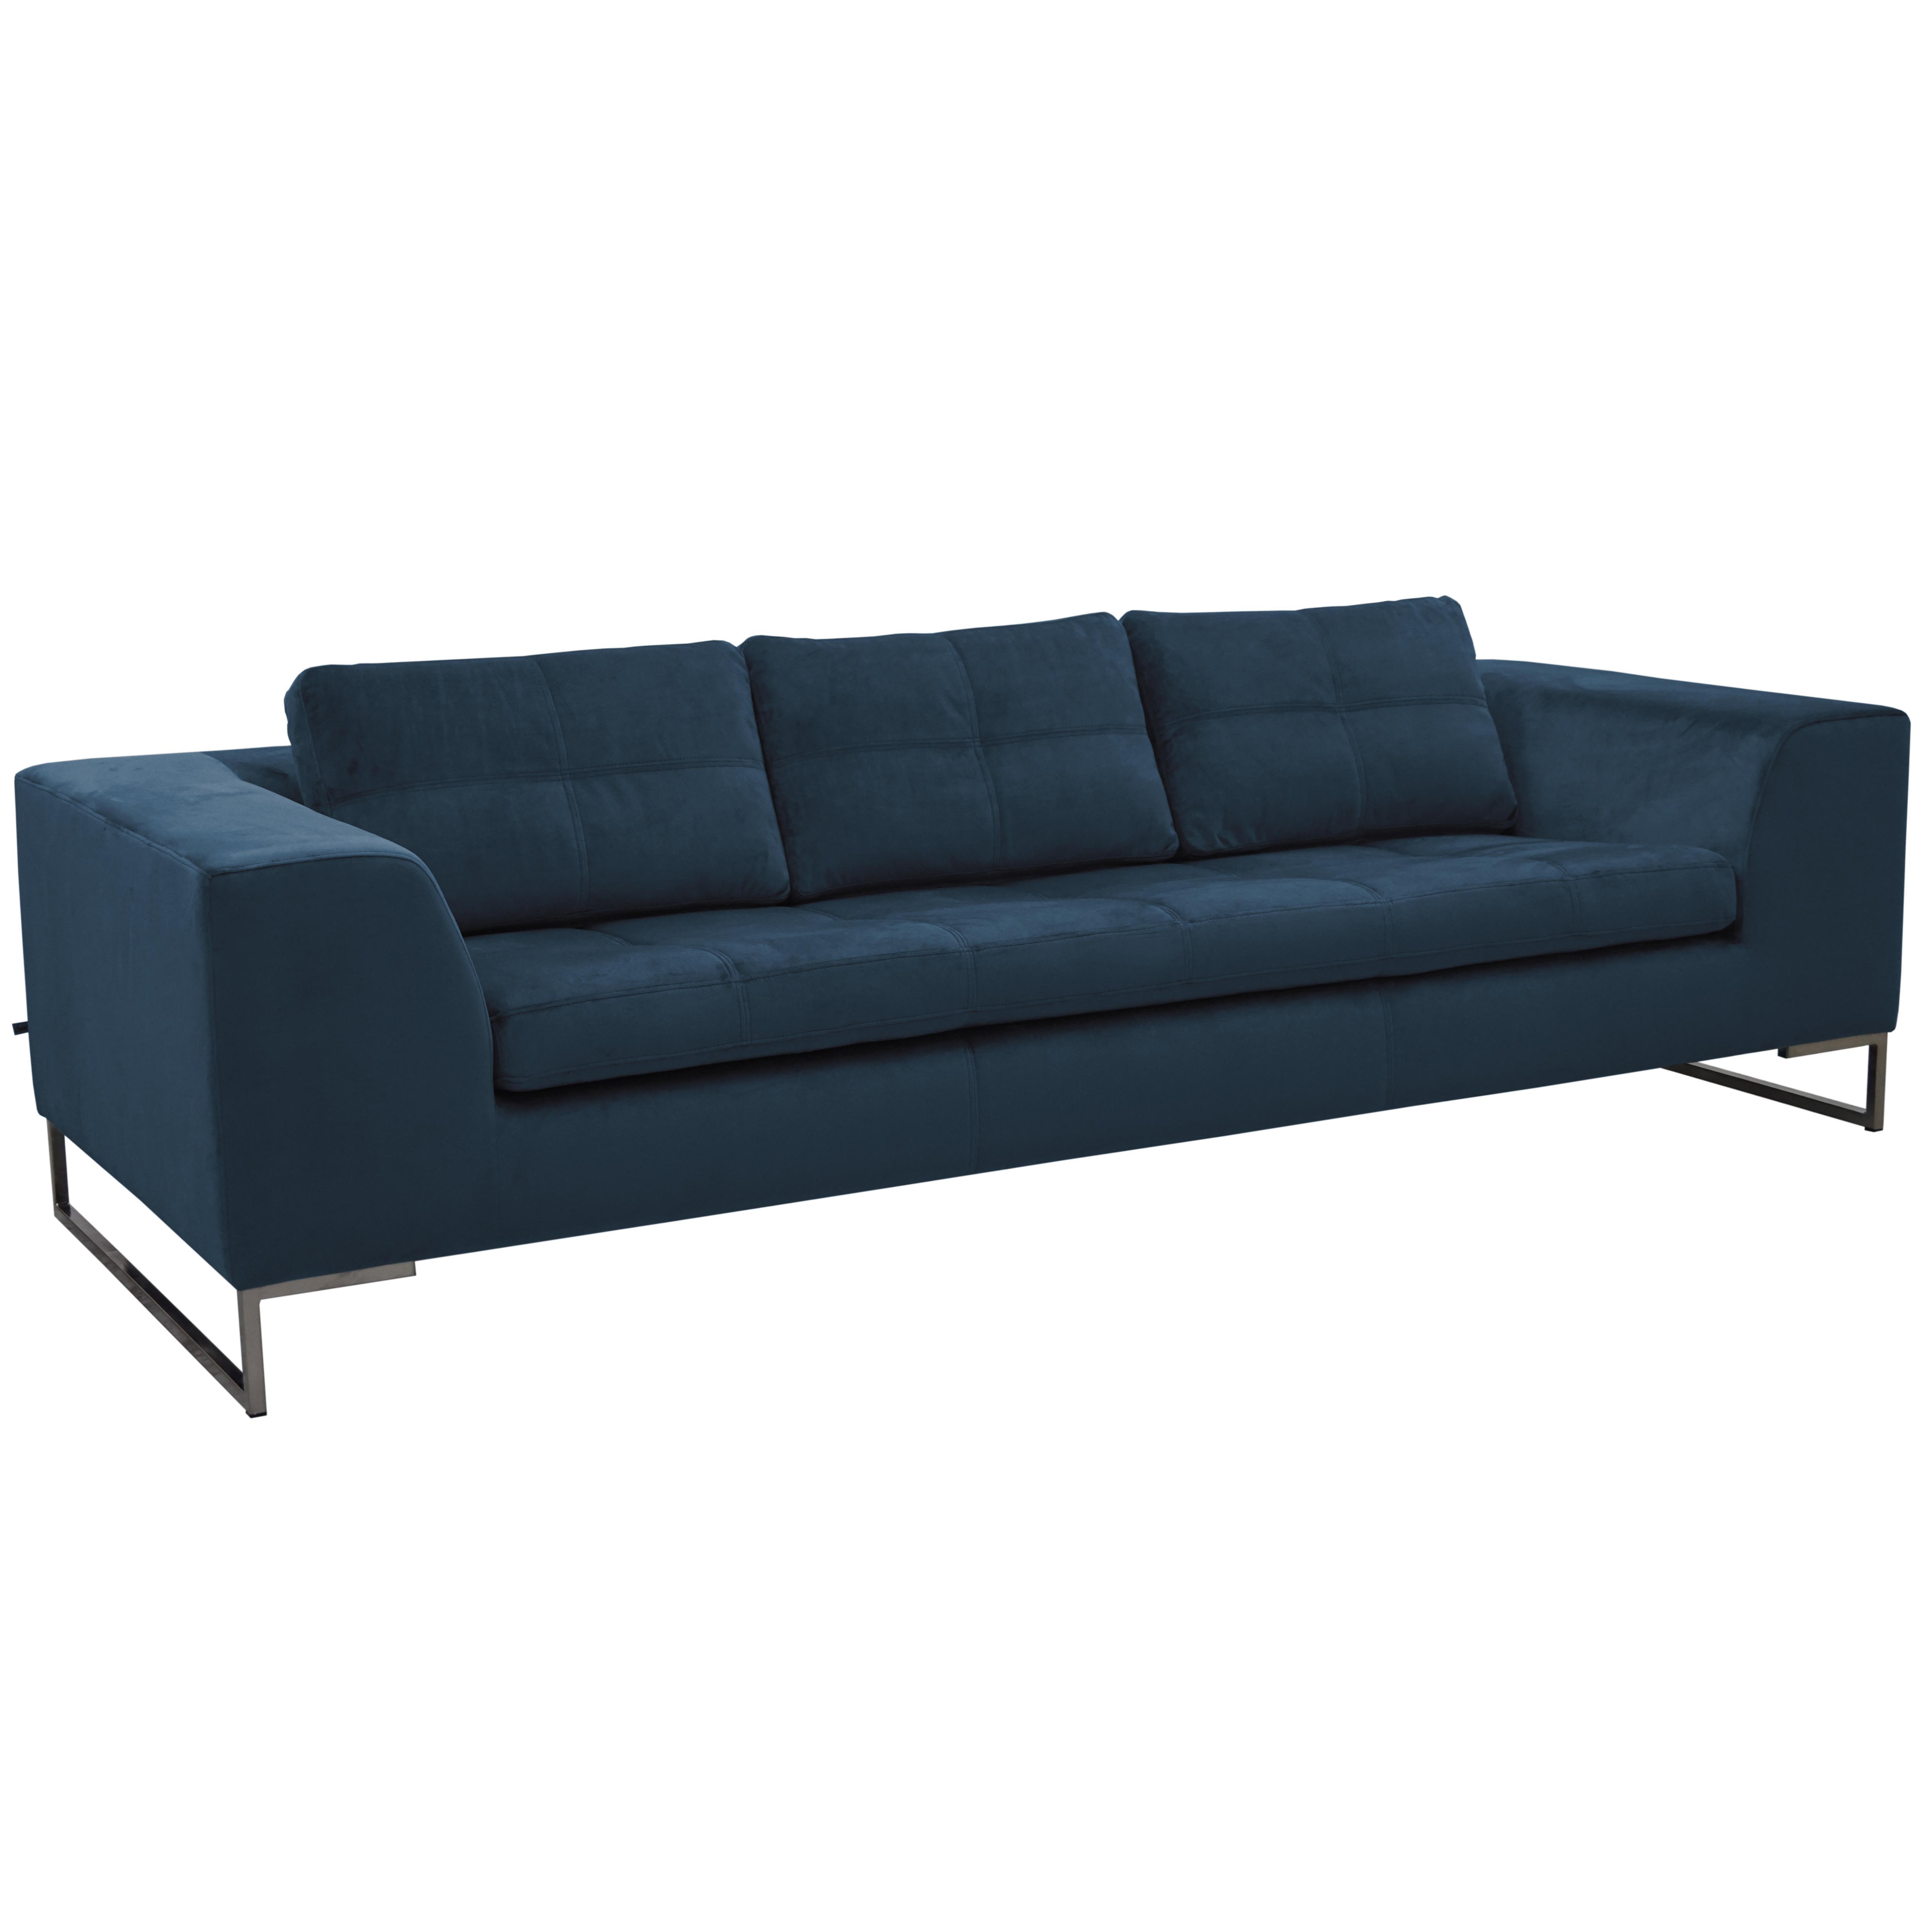 Toleda three seater sofa alba velvet blue